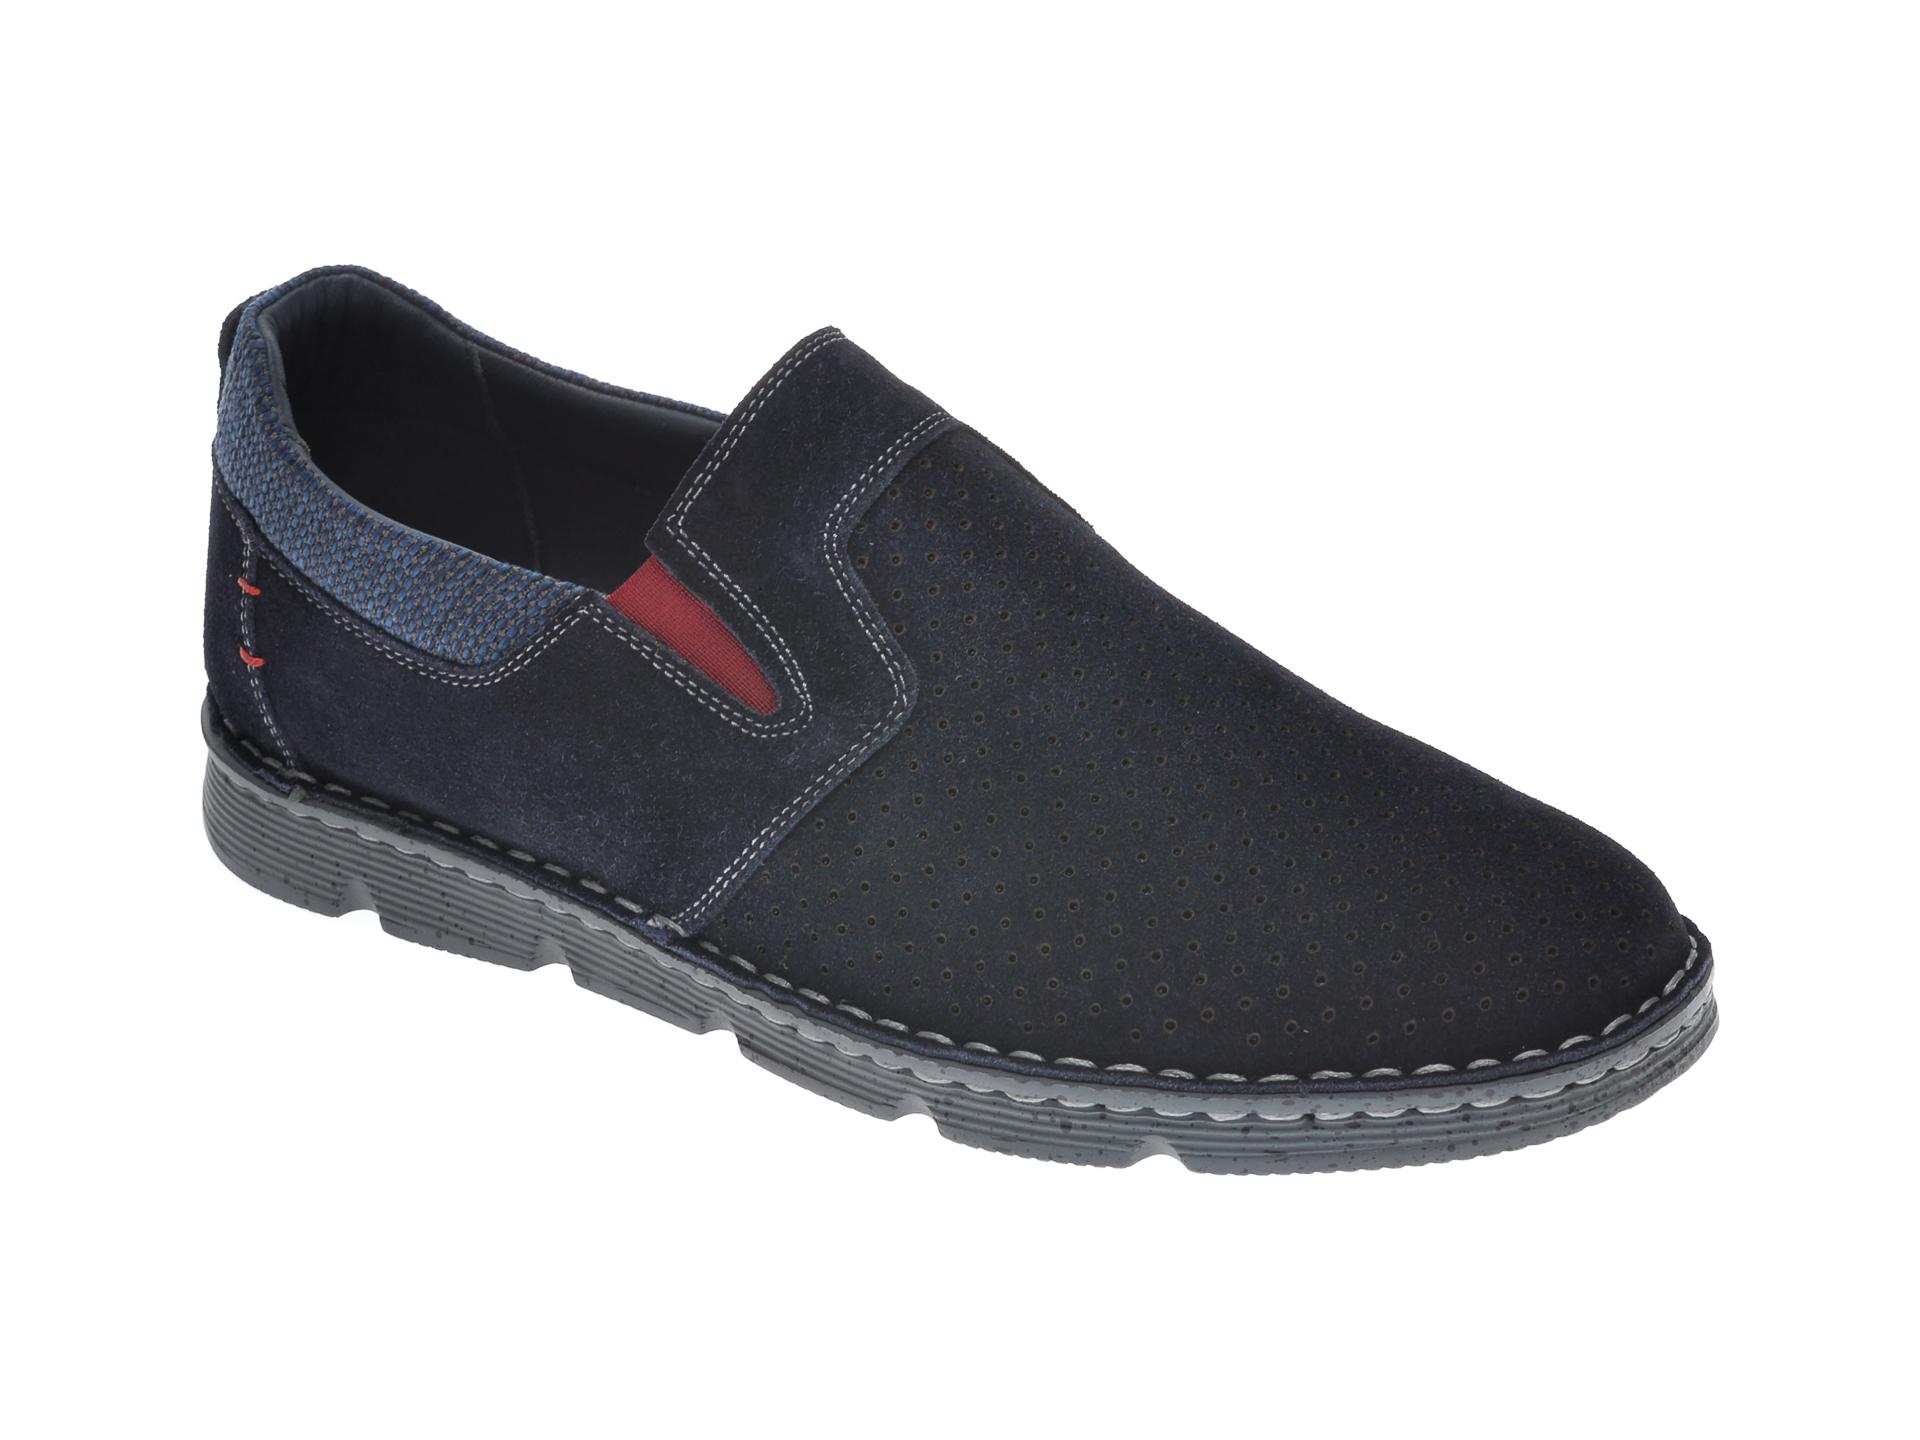 Pantofi OTTER bleumarin, 2832, din piele intoarsa New